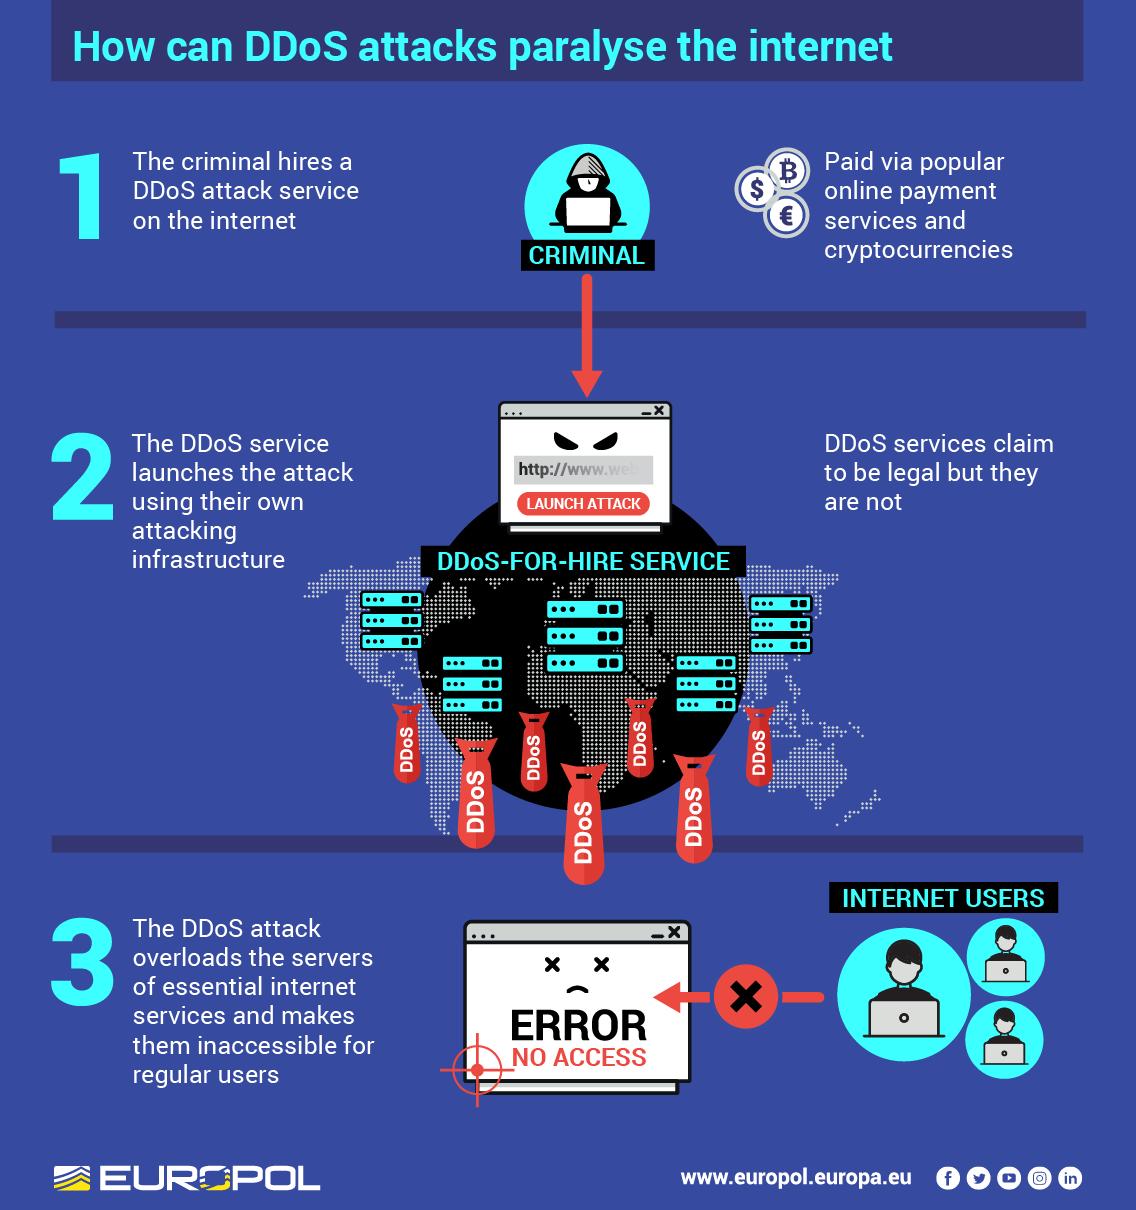 Europol_DDoS_infographic